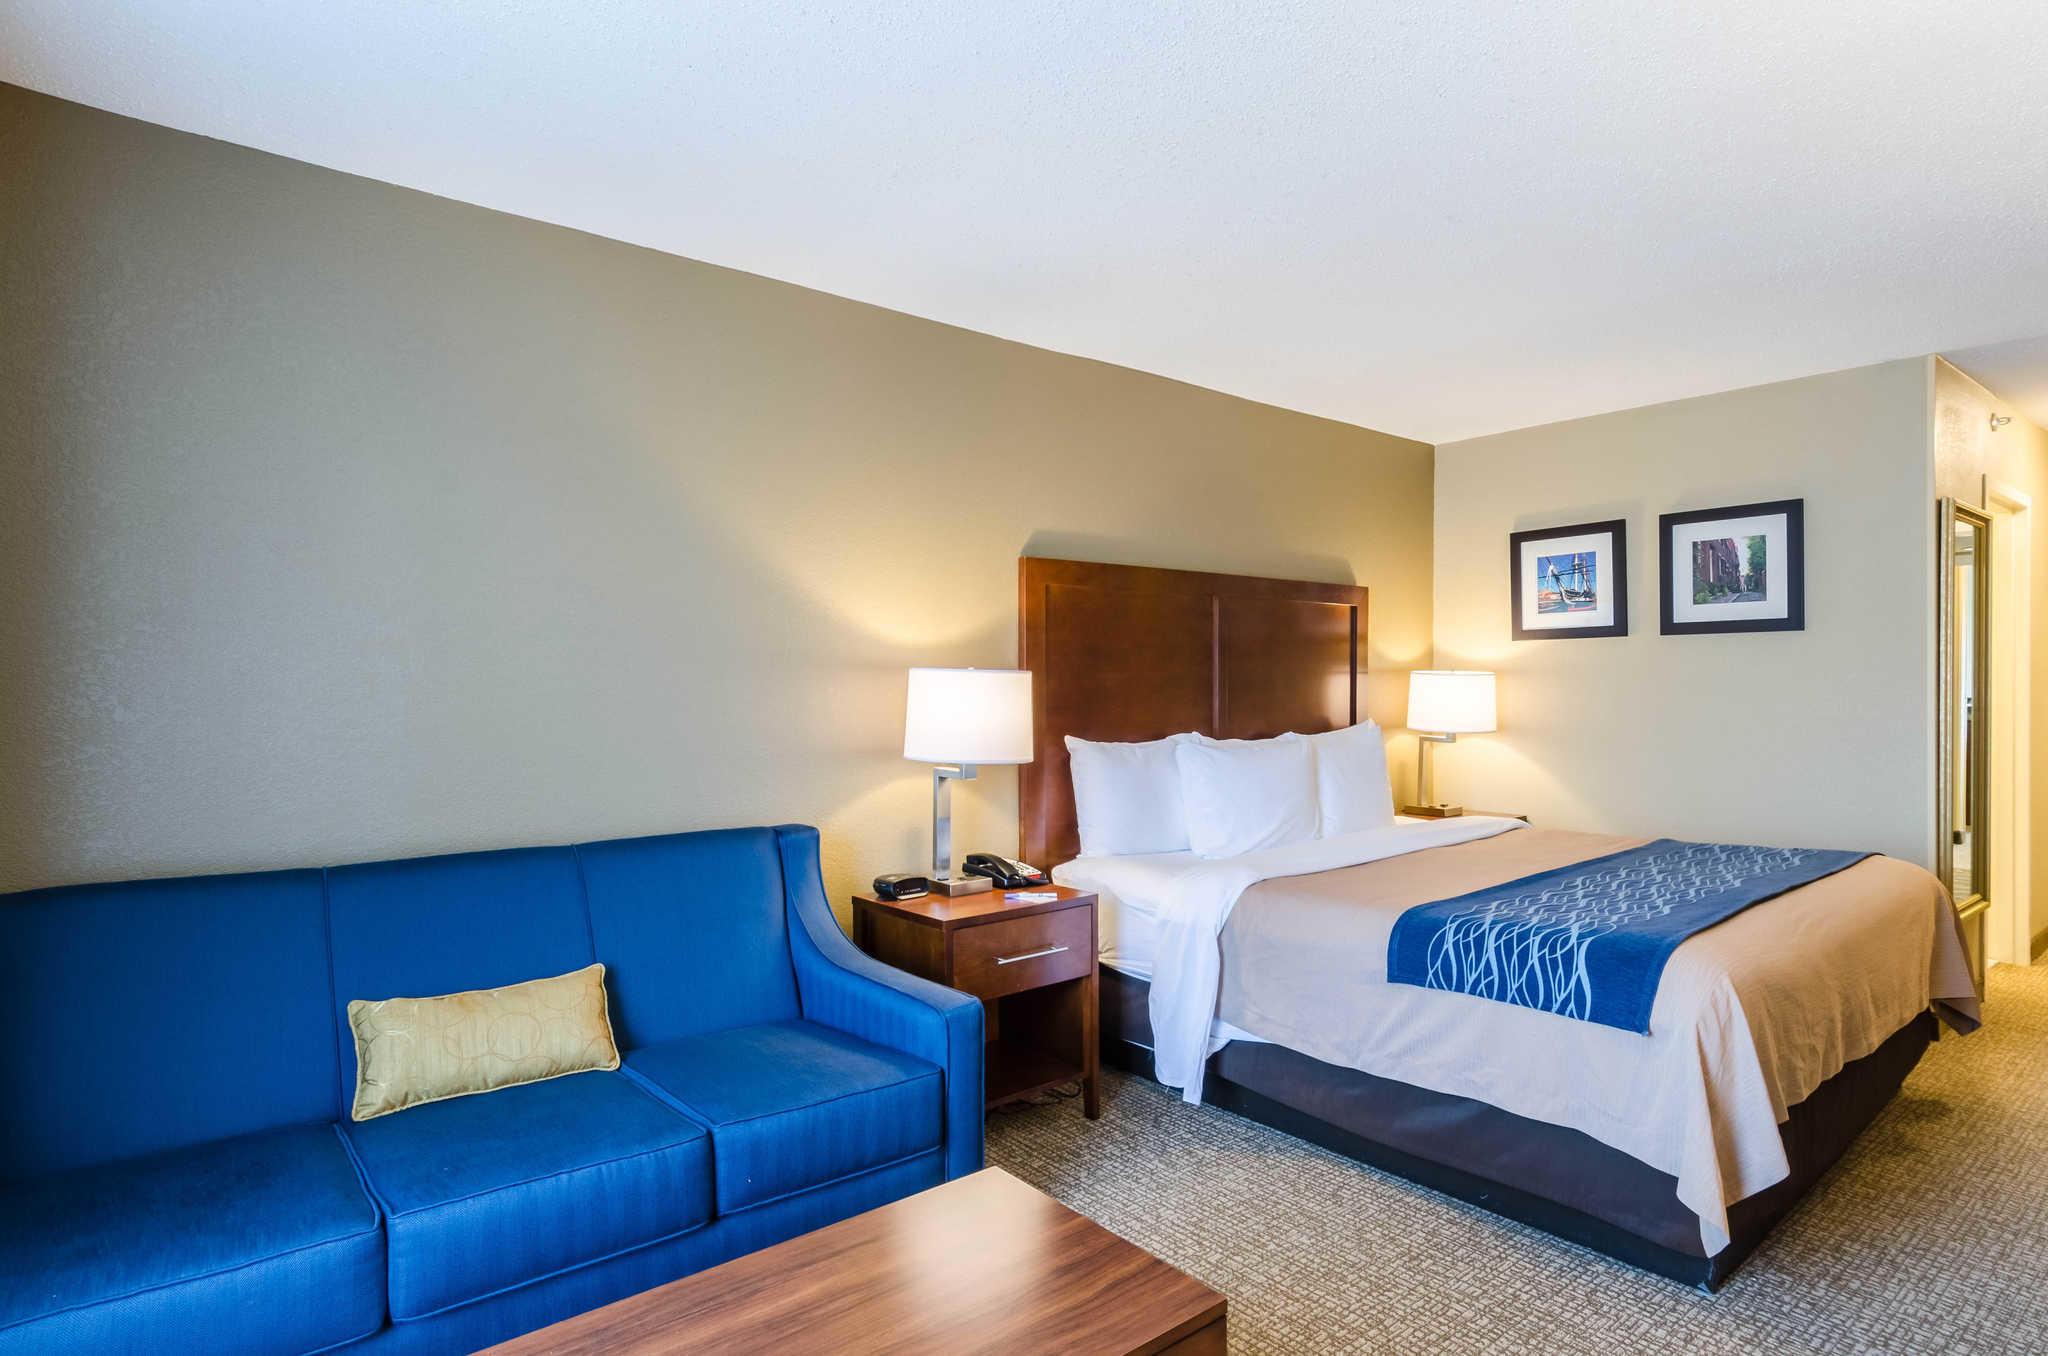 Comfort Inn Randolph - Boston image 44